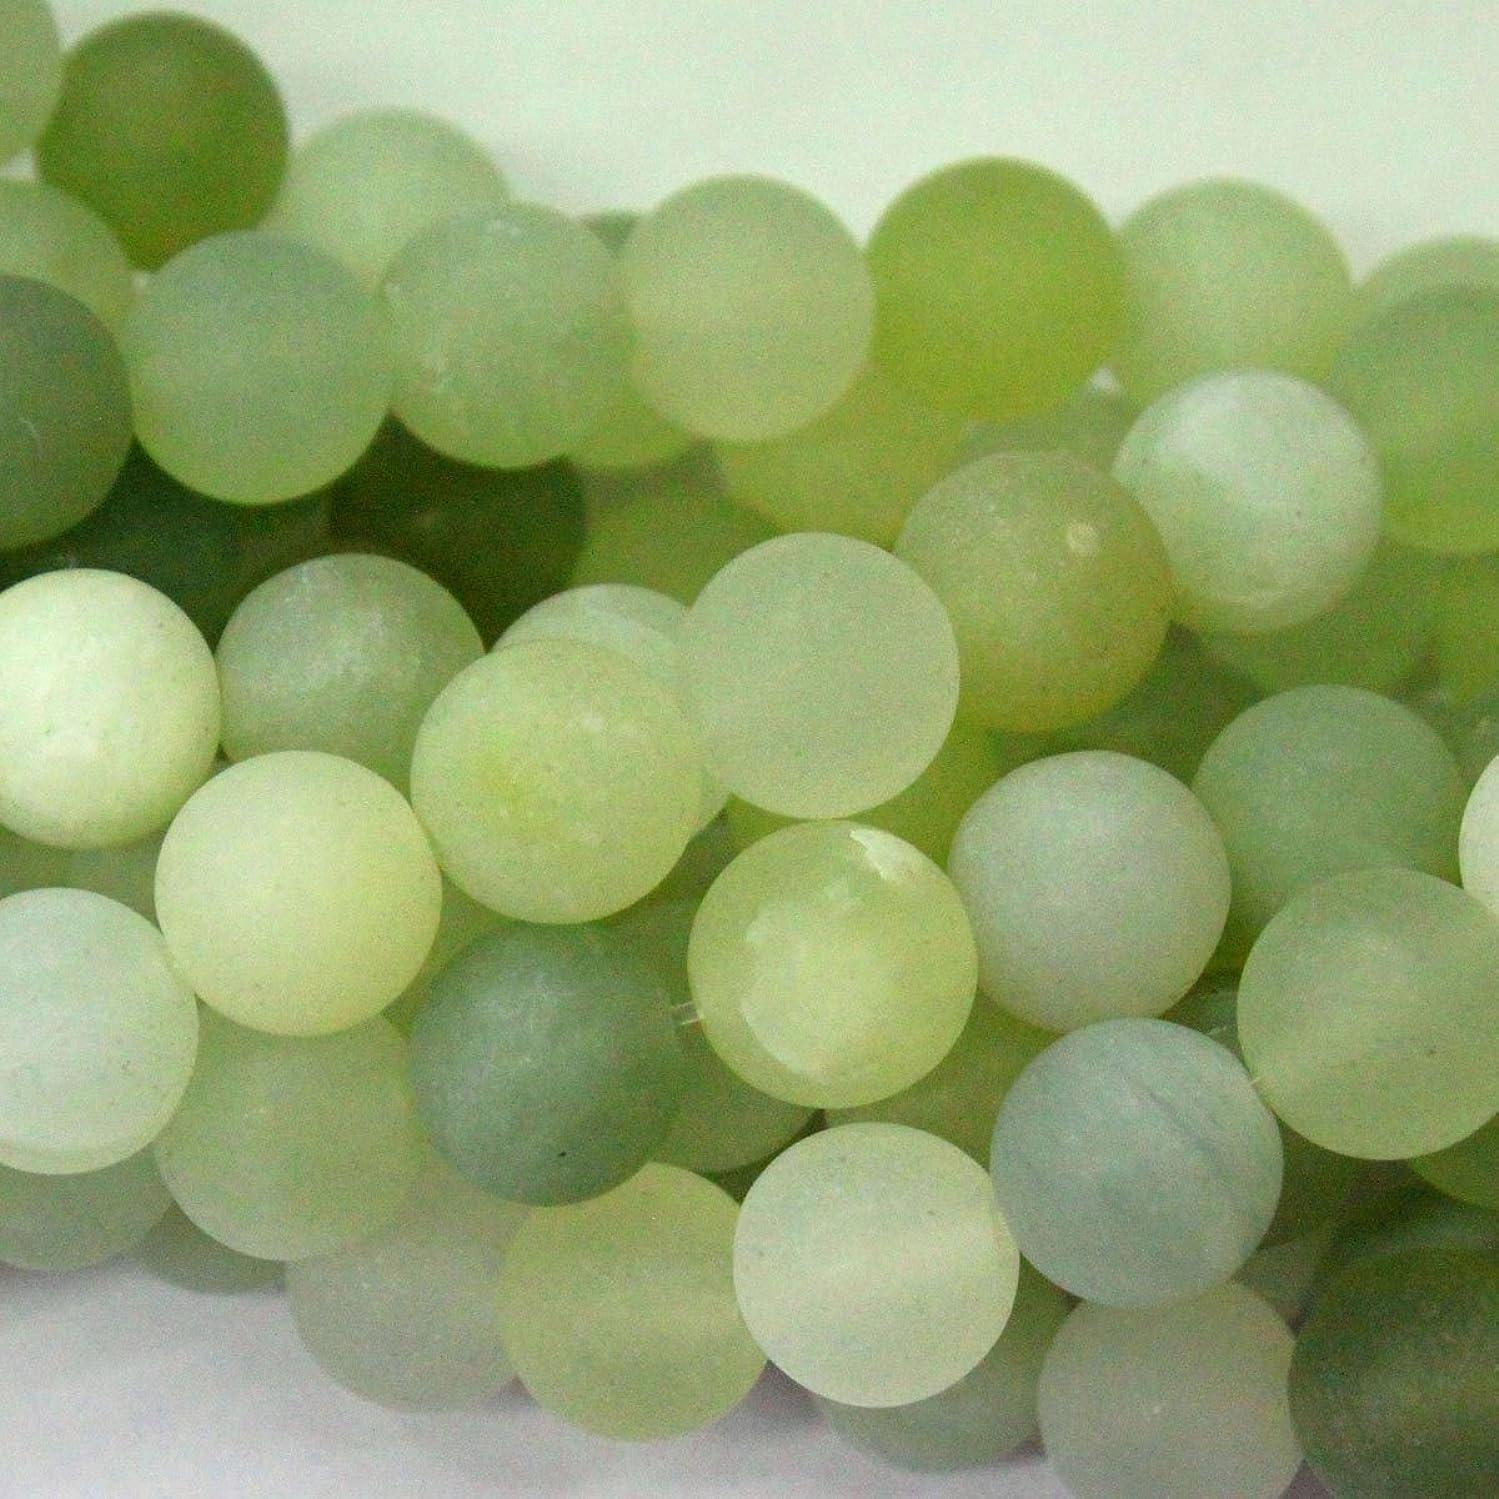 Natural Unpolished New Green Jade 10mm Matte Round Jewerlry Making Gemstone Beads